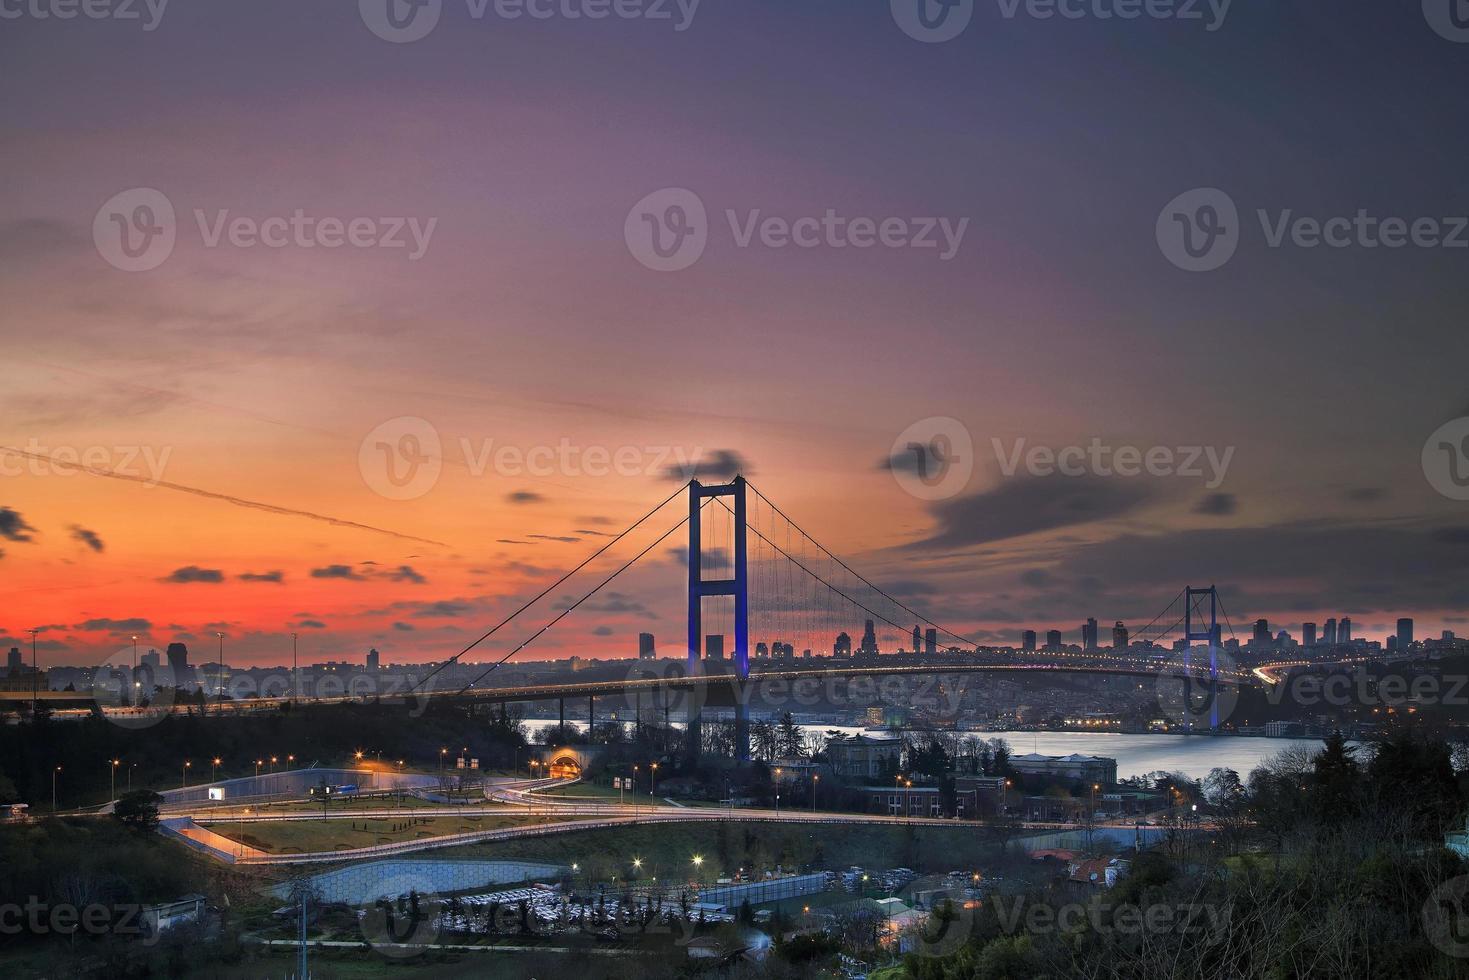 Boğaziçi Köprüsü photo